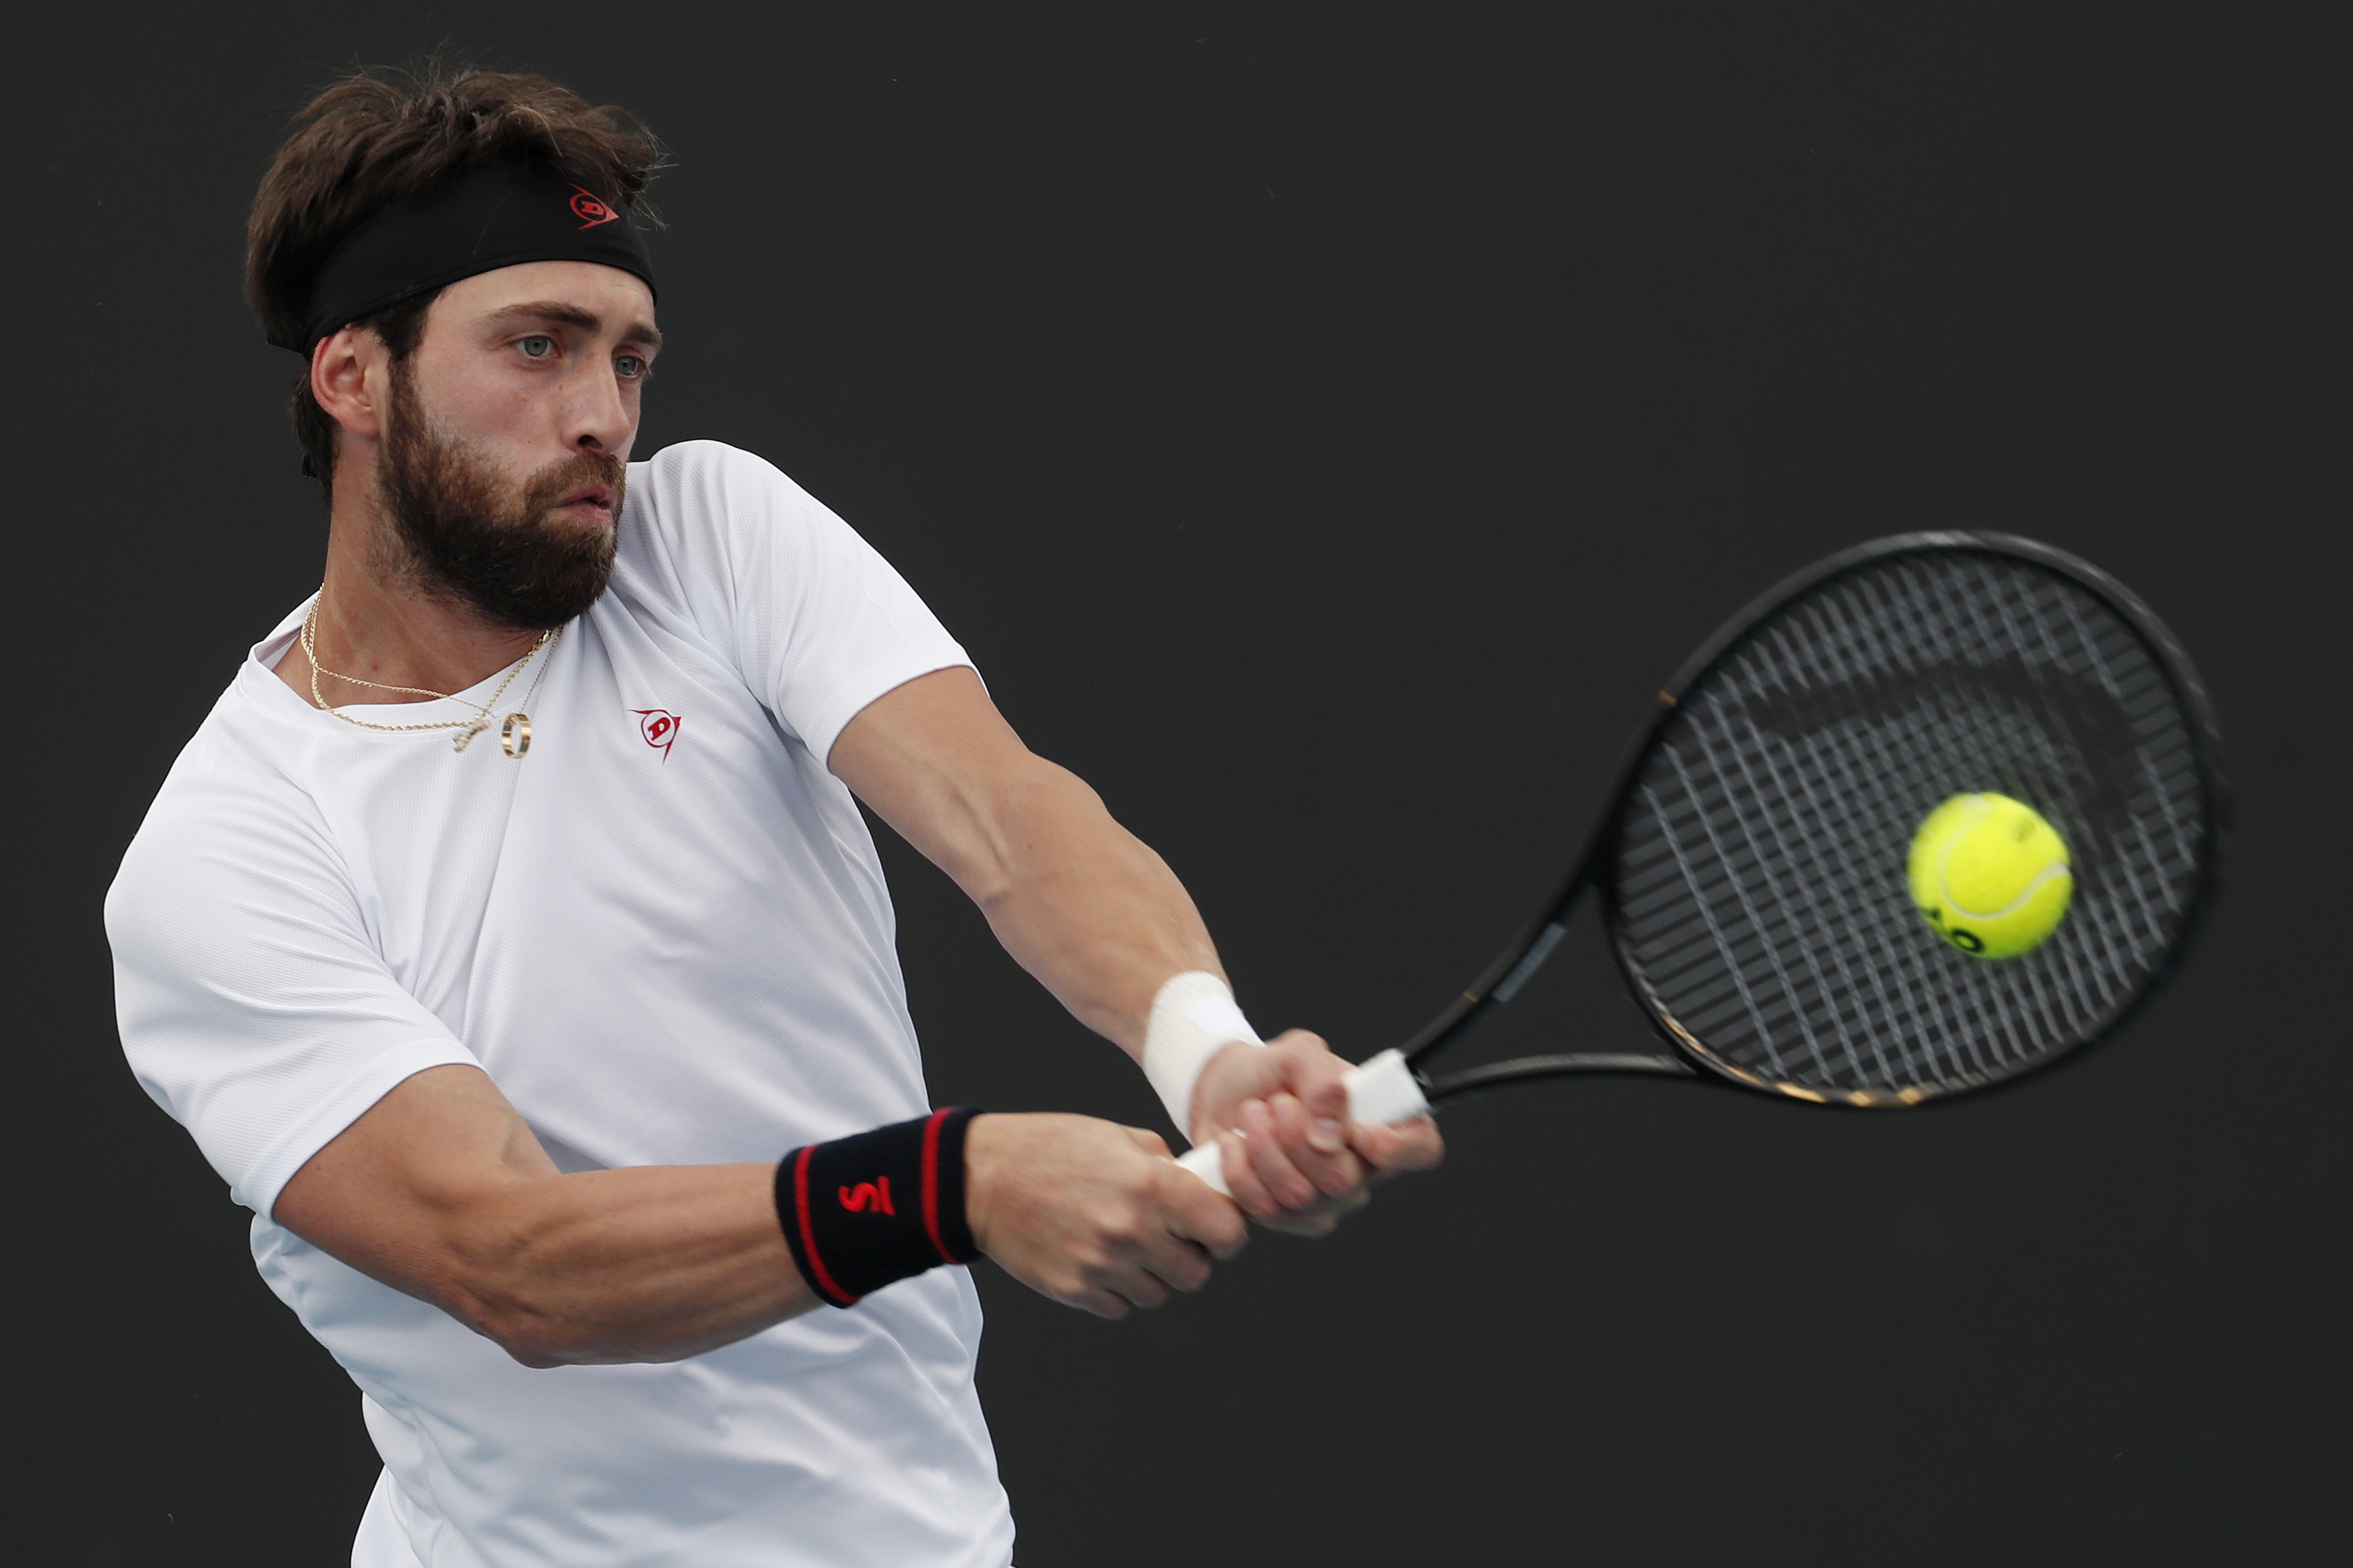 Tenista Nikoloz Basilashvili acusado de violência doméstica